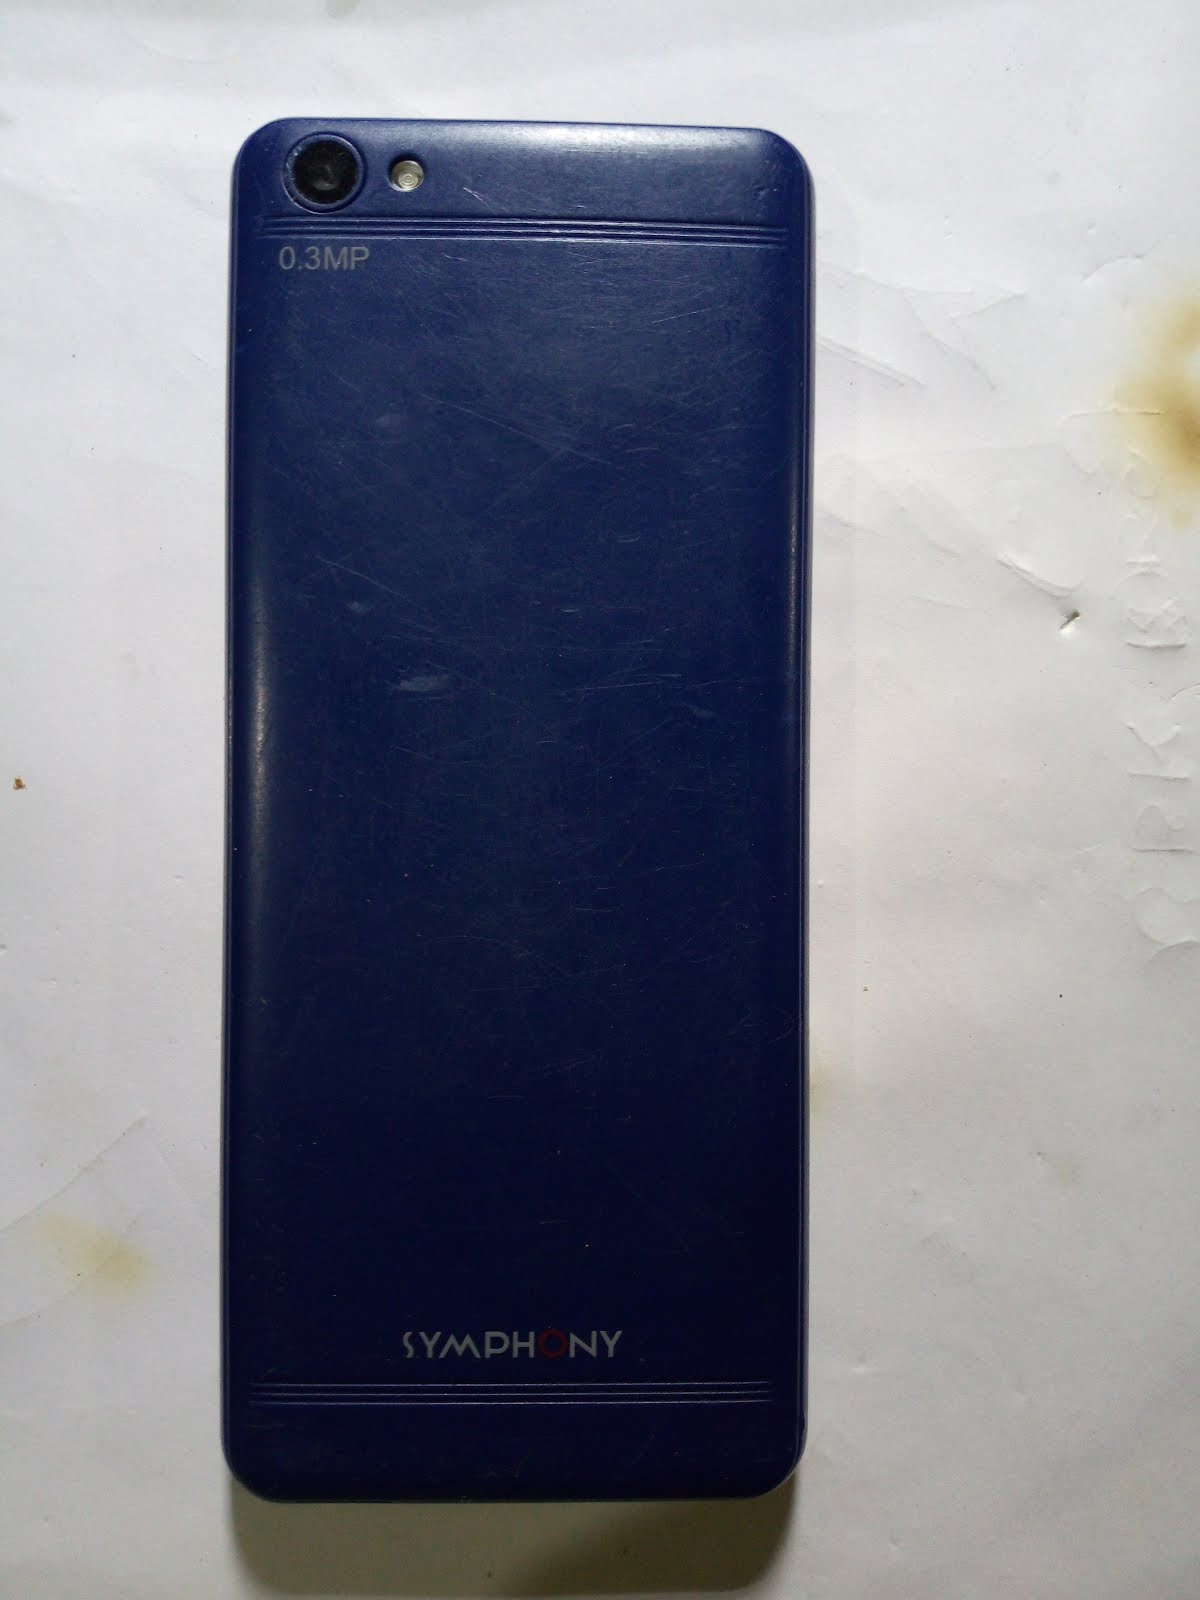 Symphony D69 Firmware www.gsmnote.blogspot.com